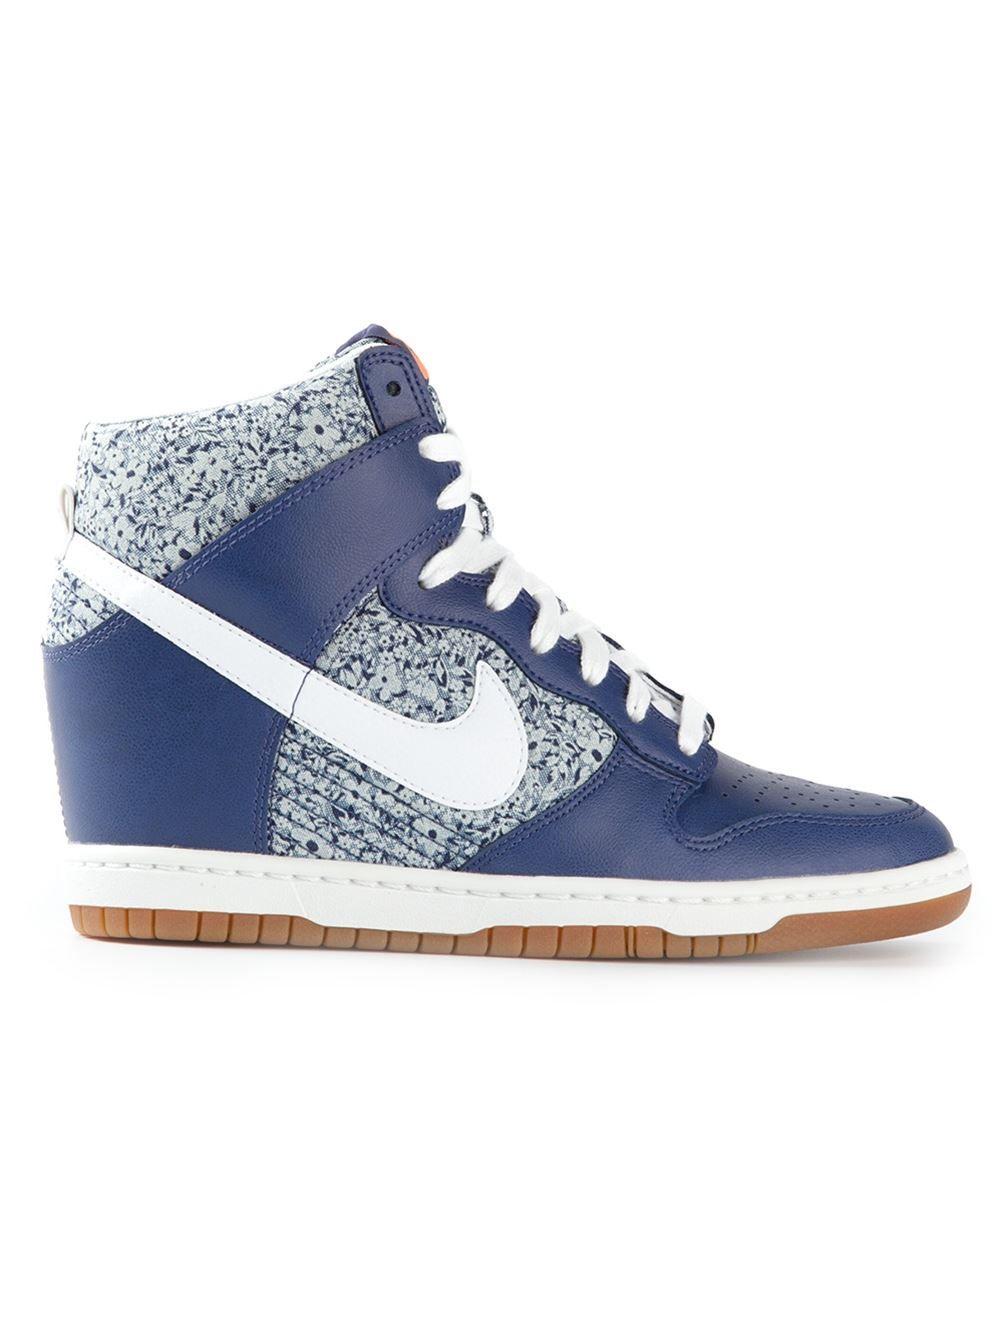 wholesale dealer 7f075 abbb3 NIKE   DUNK SKY HI-TOP SNEAKERS Floral Heels, Nike Dunks, Types Of